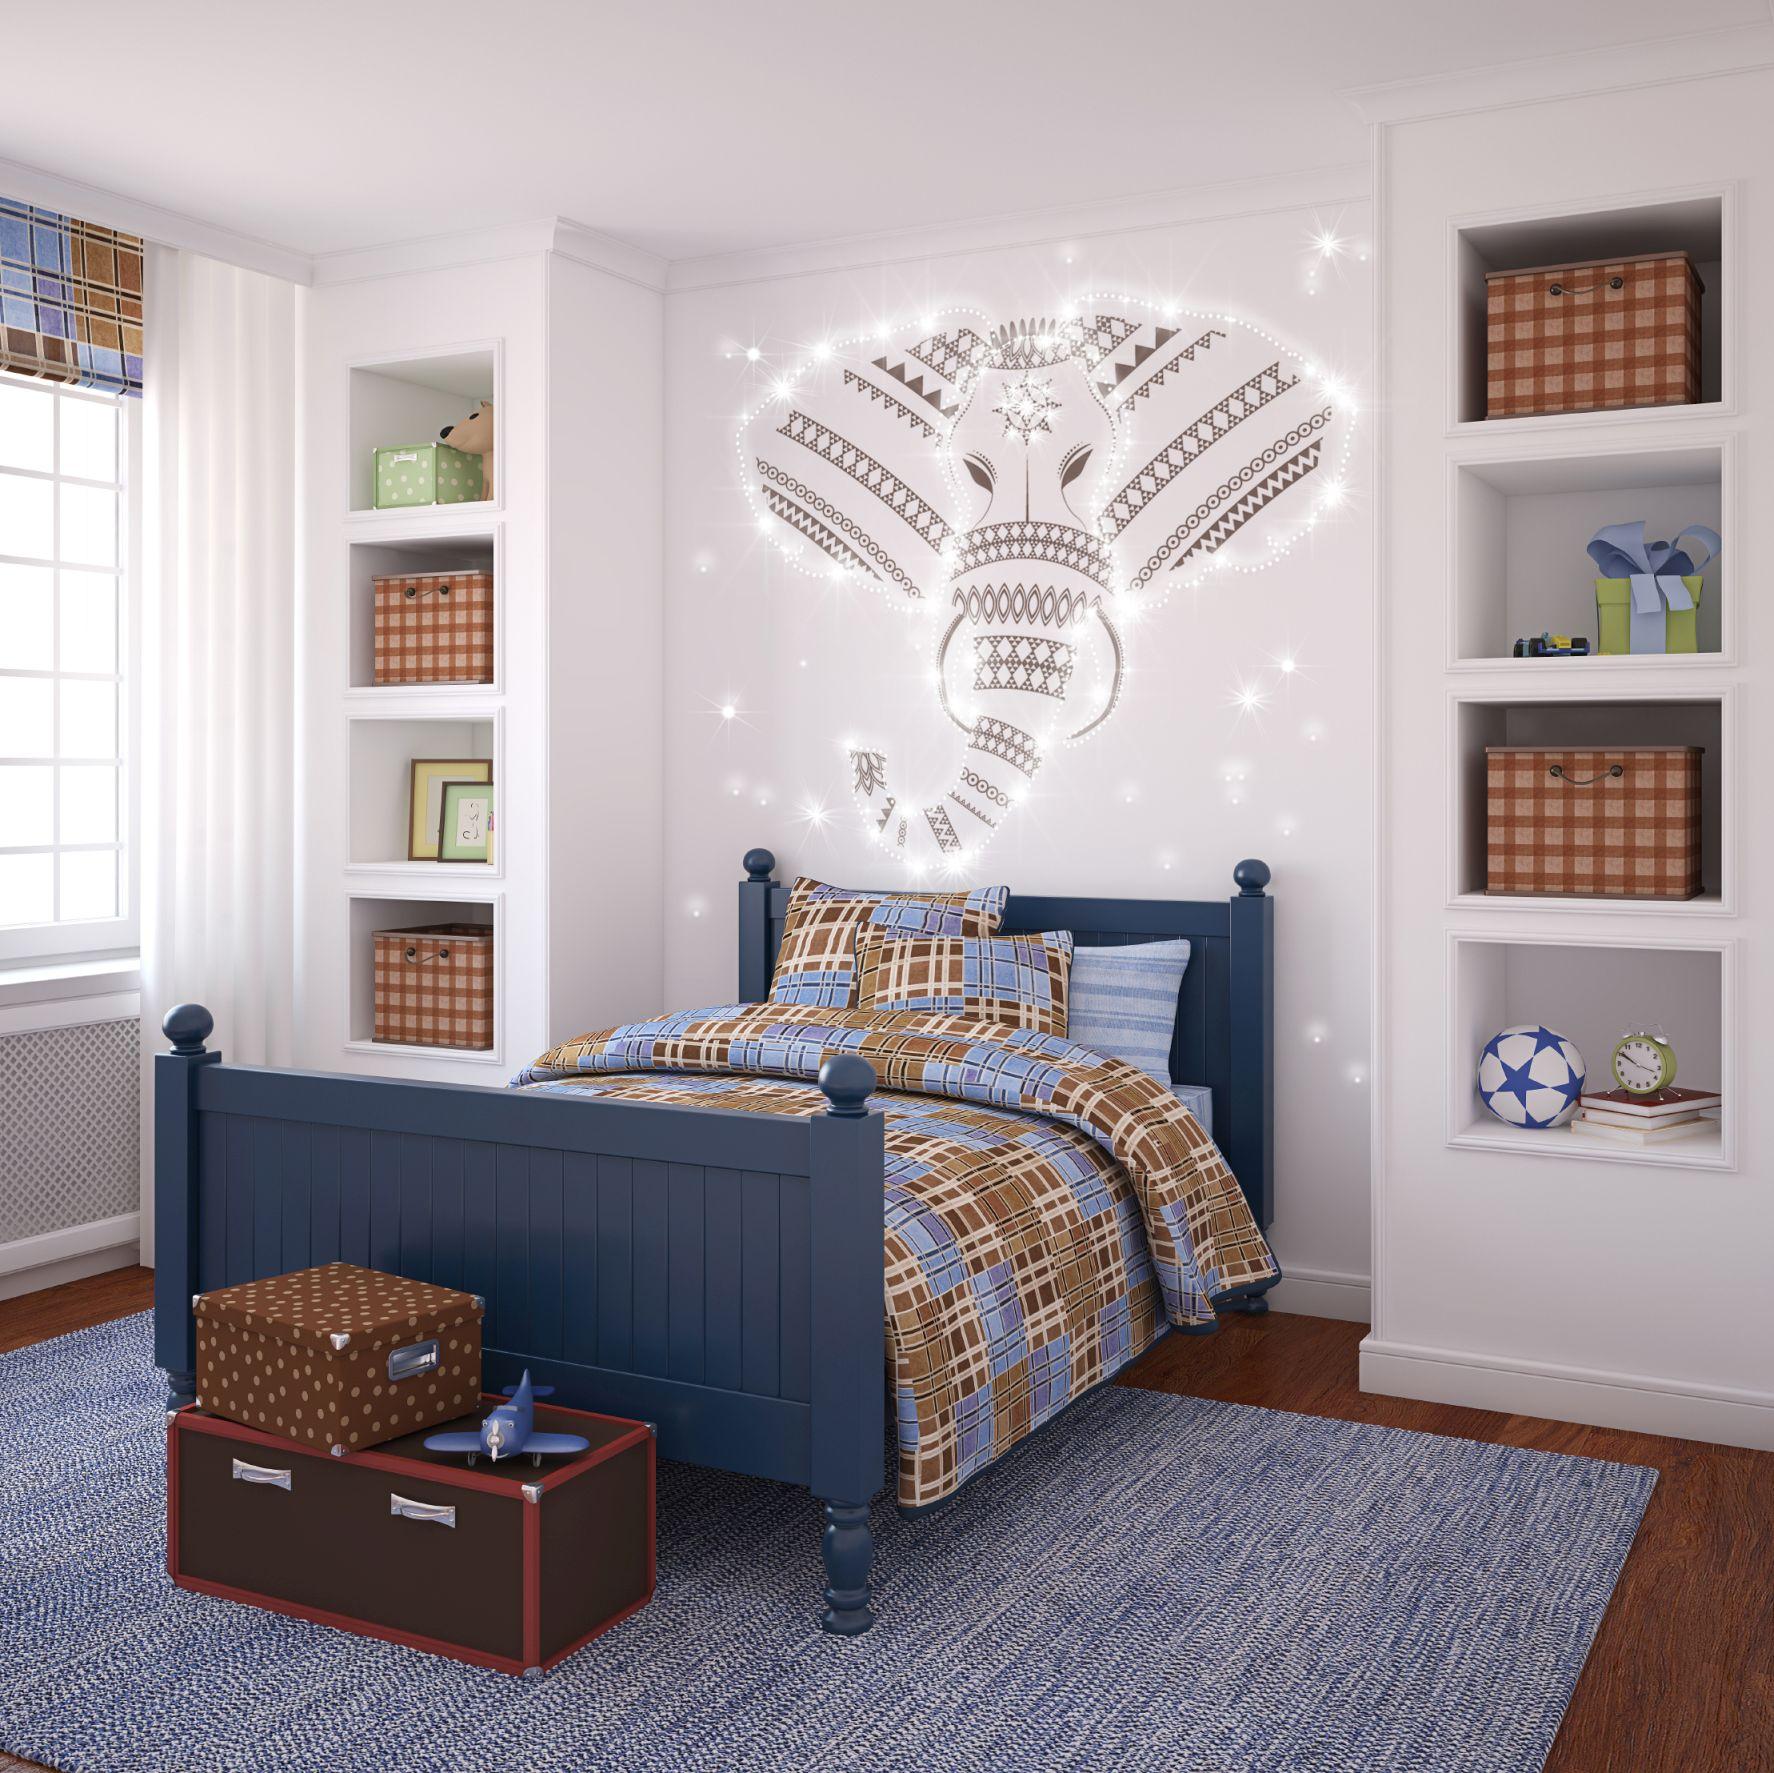 pixlum led sternenhimmel und pixlum led lichtdekorationen. Black Bedroom Furniture Sets. Home Design Ideas